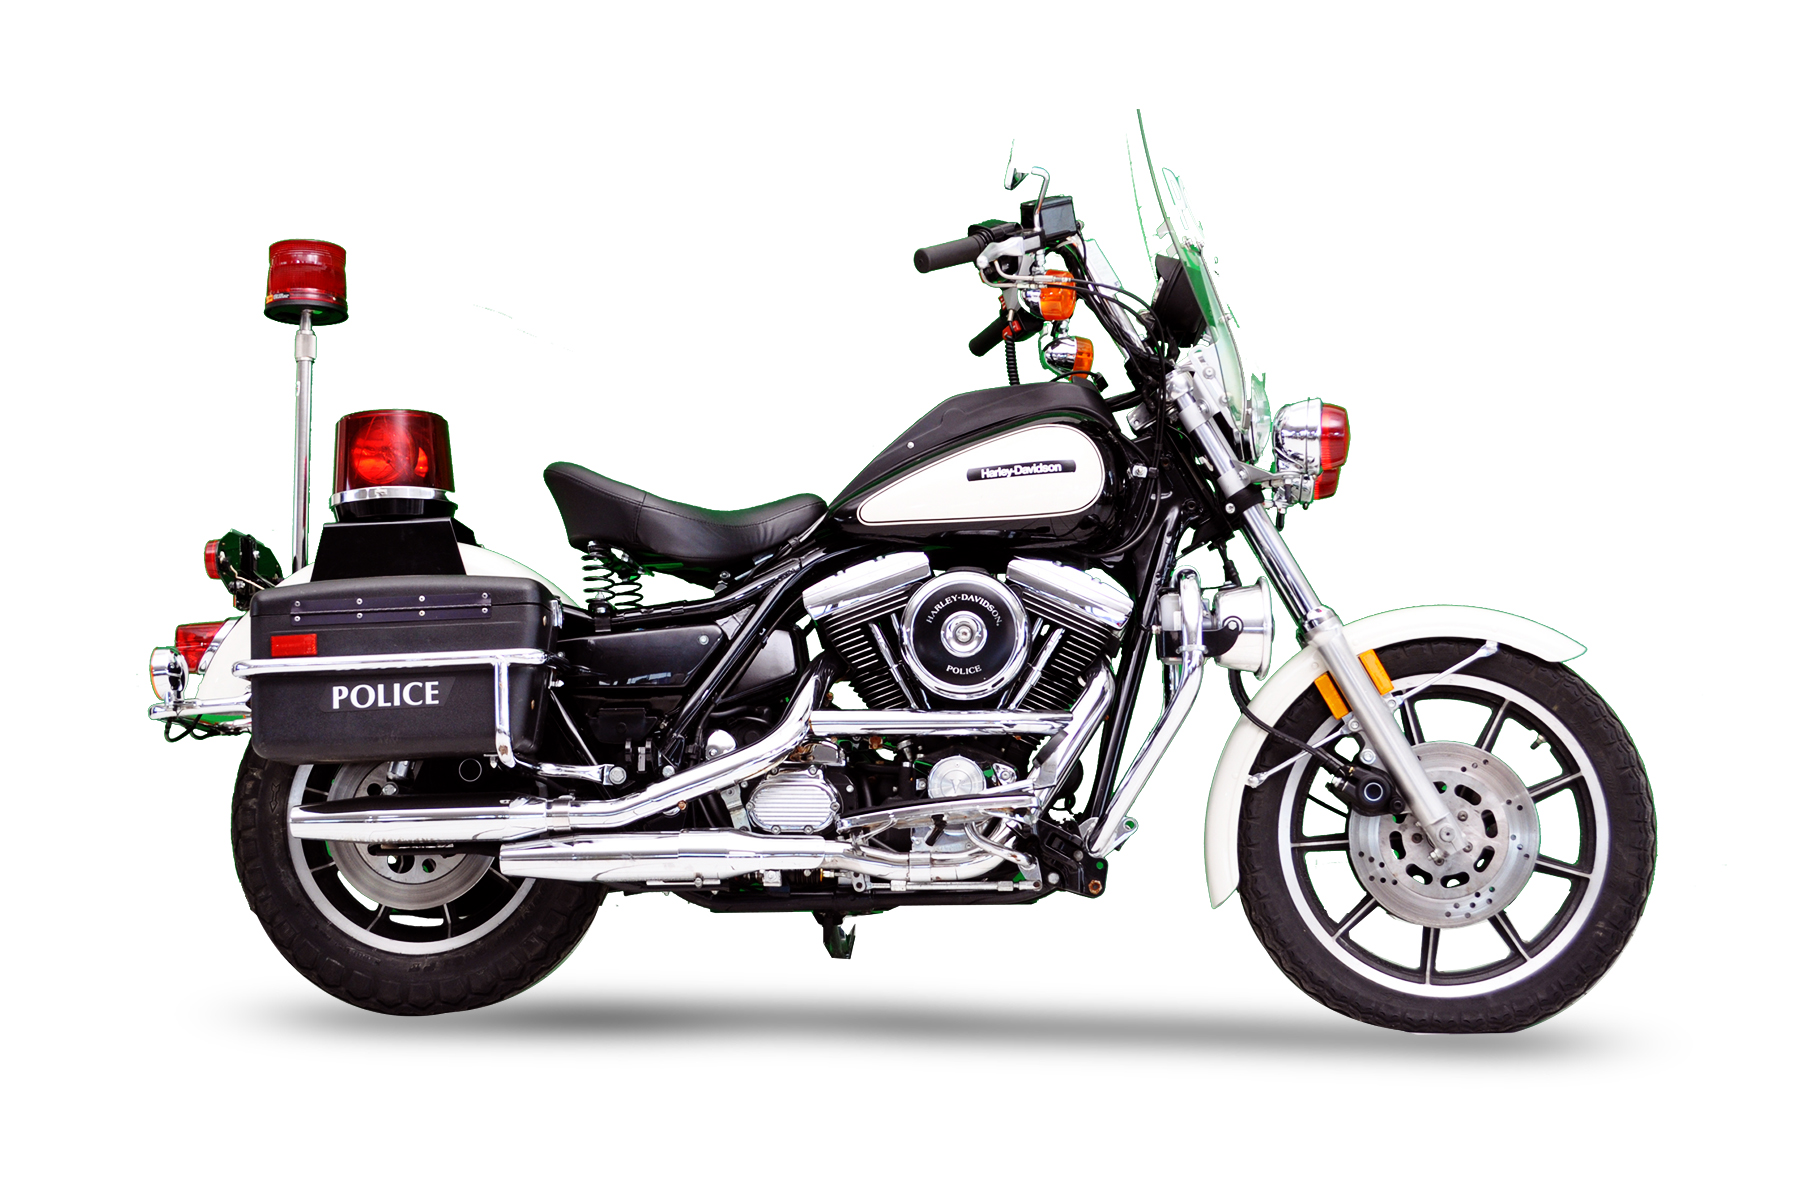 Original Harley Davidson Motorcycle >> 1994 Harley Davidson FXRP Police wallpaper | 1800x1196 | 137404 | WallpaperUP